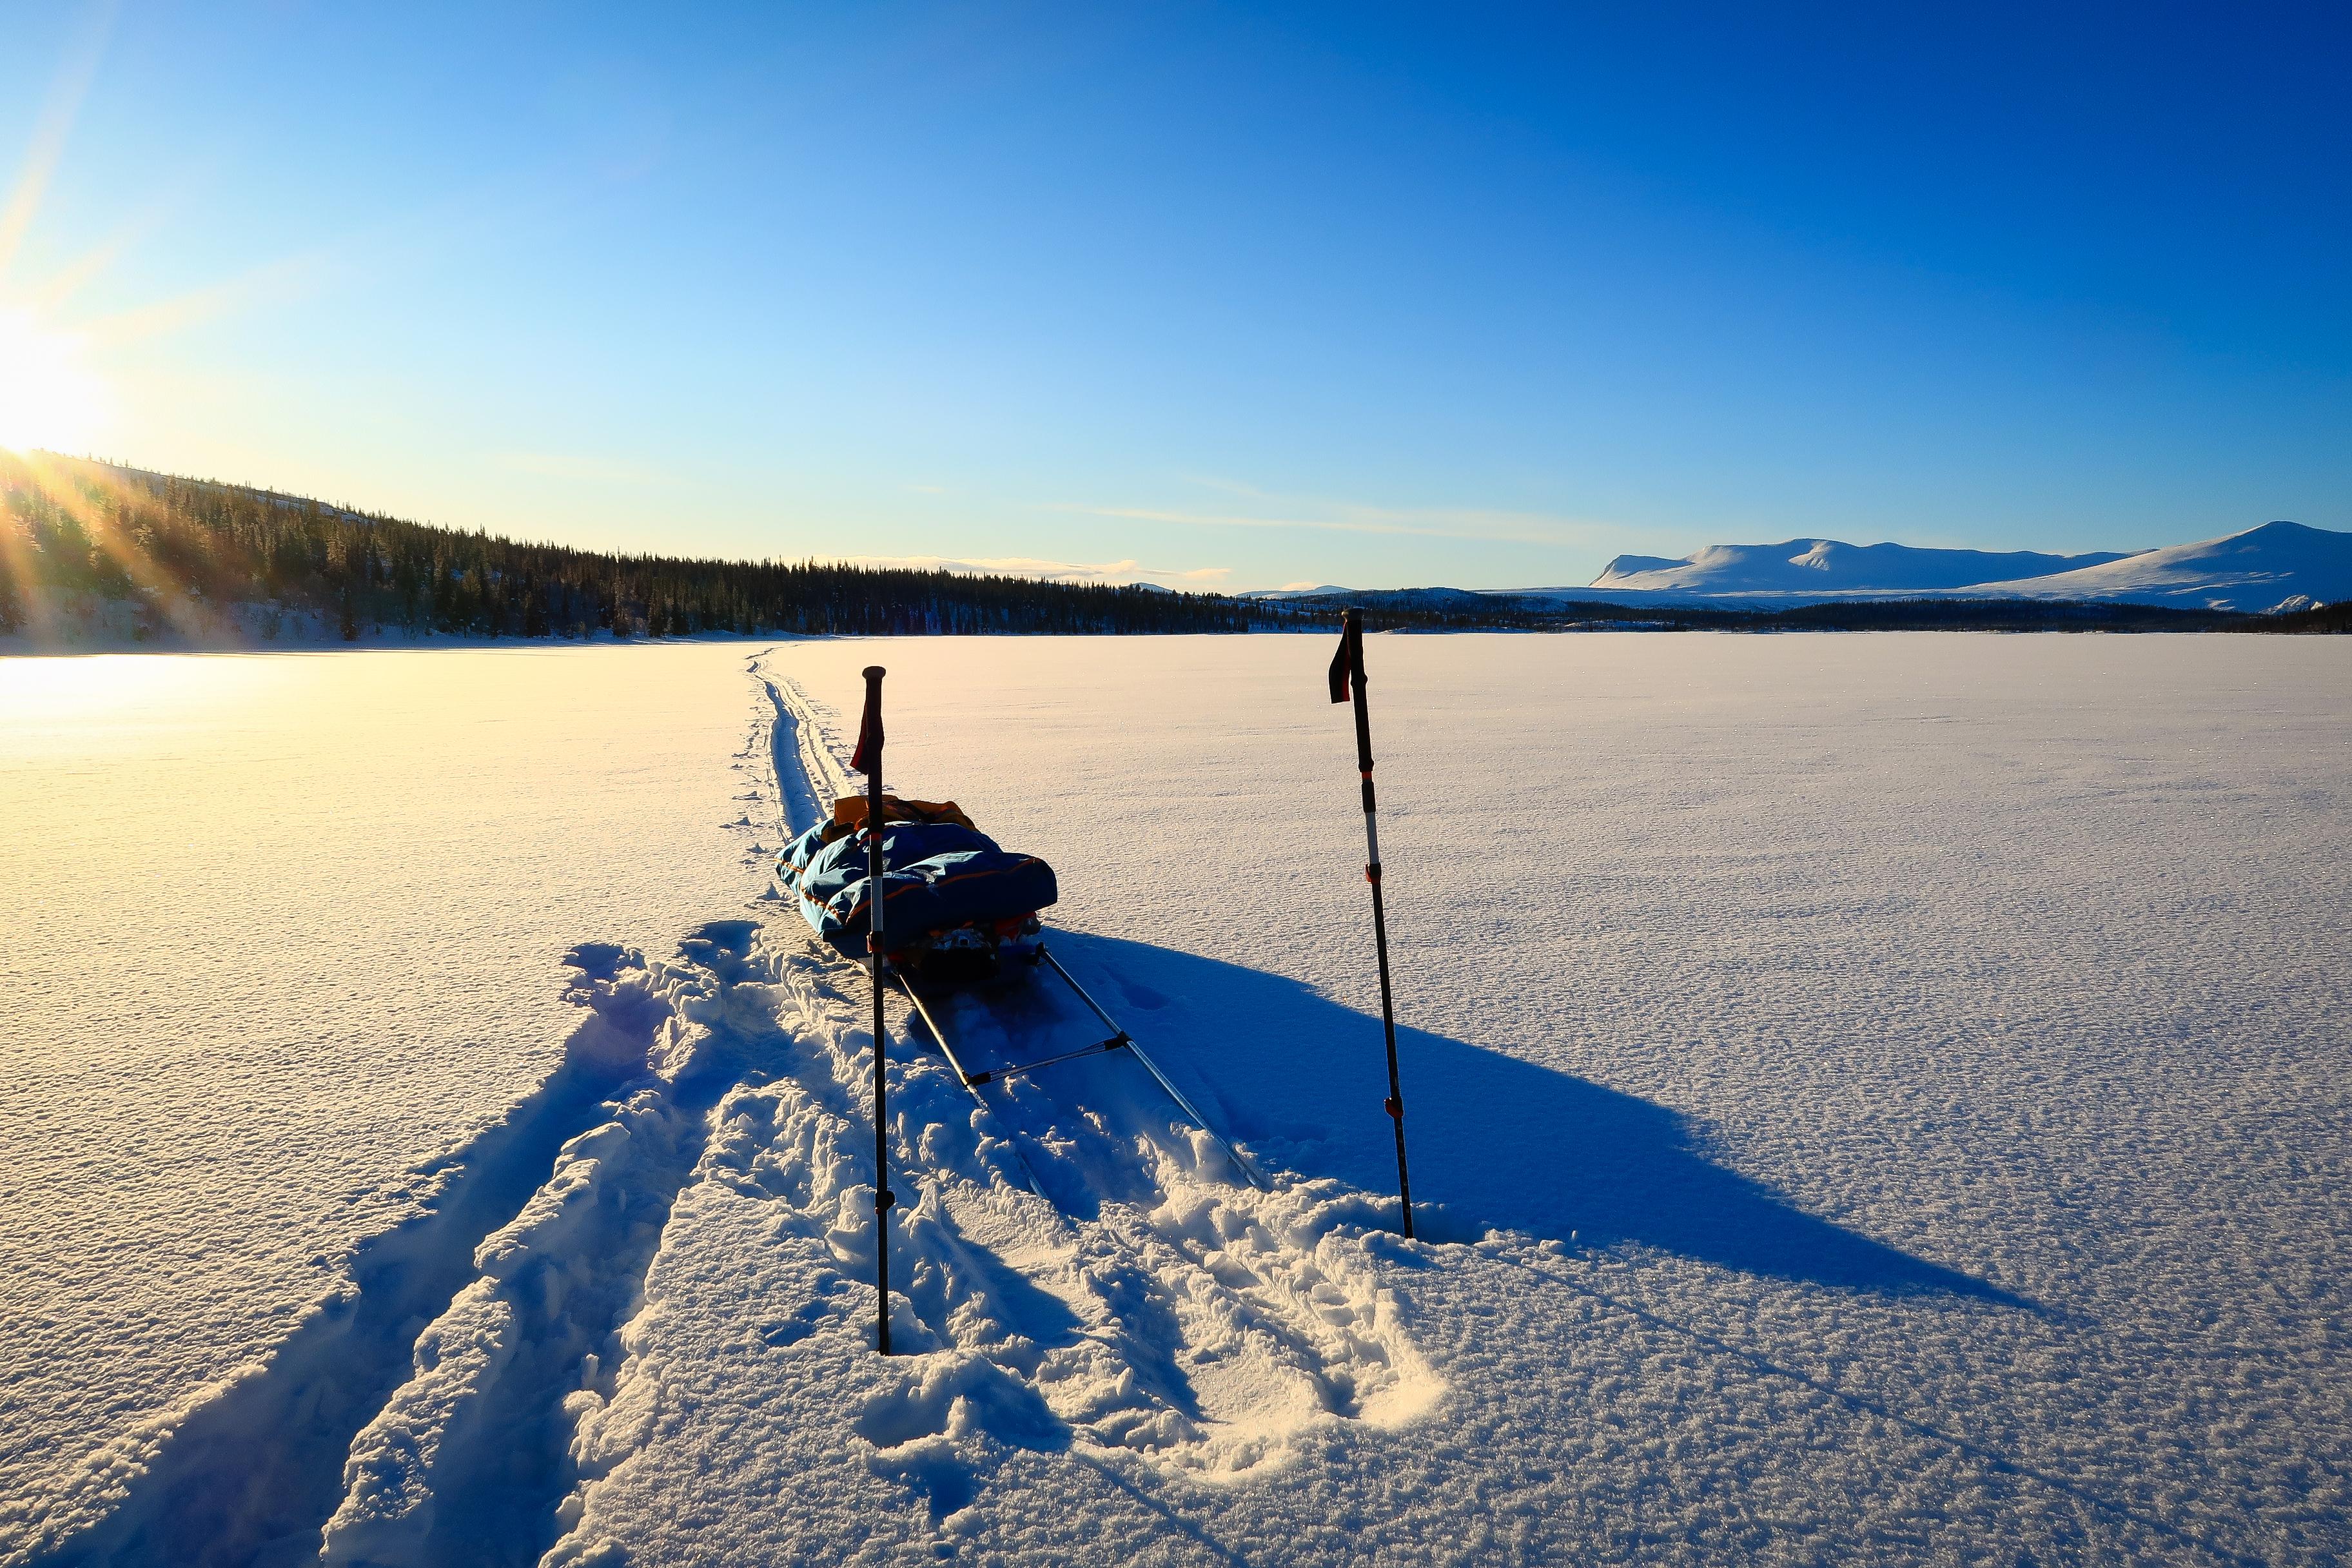 Making fresh tracks across a frozen lake